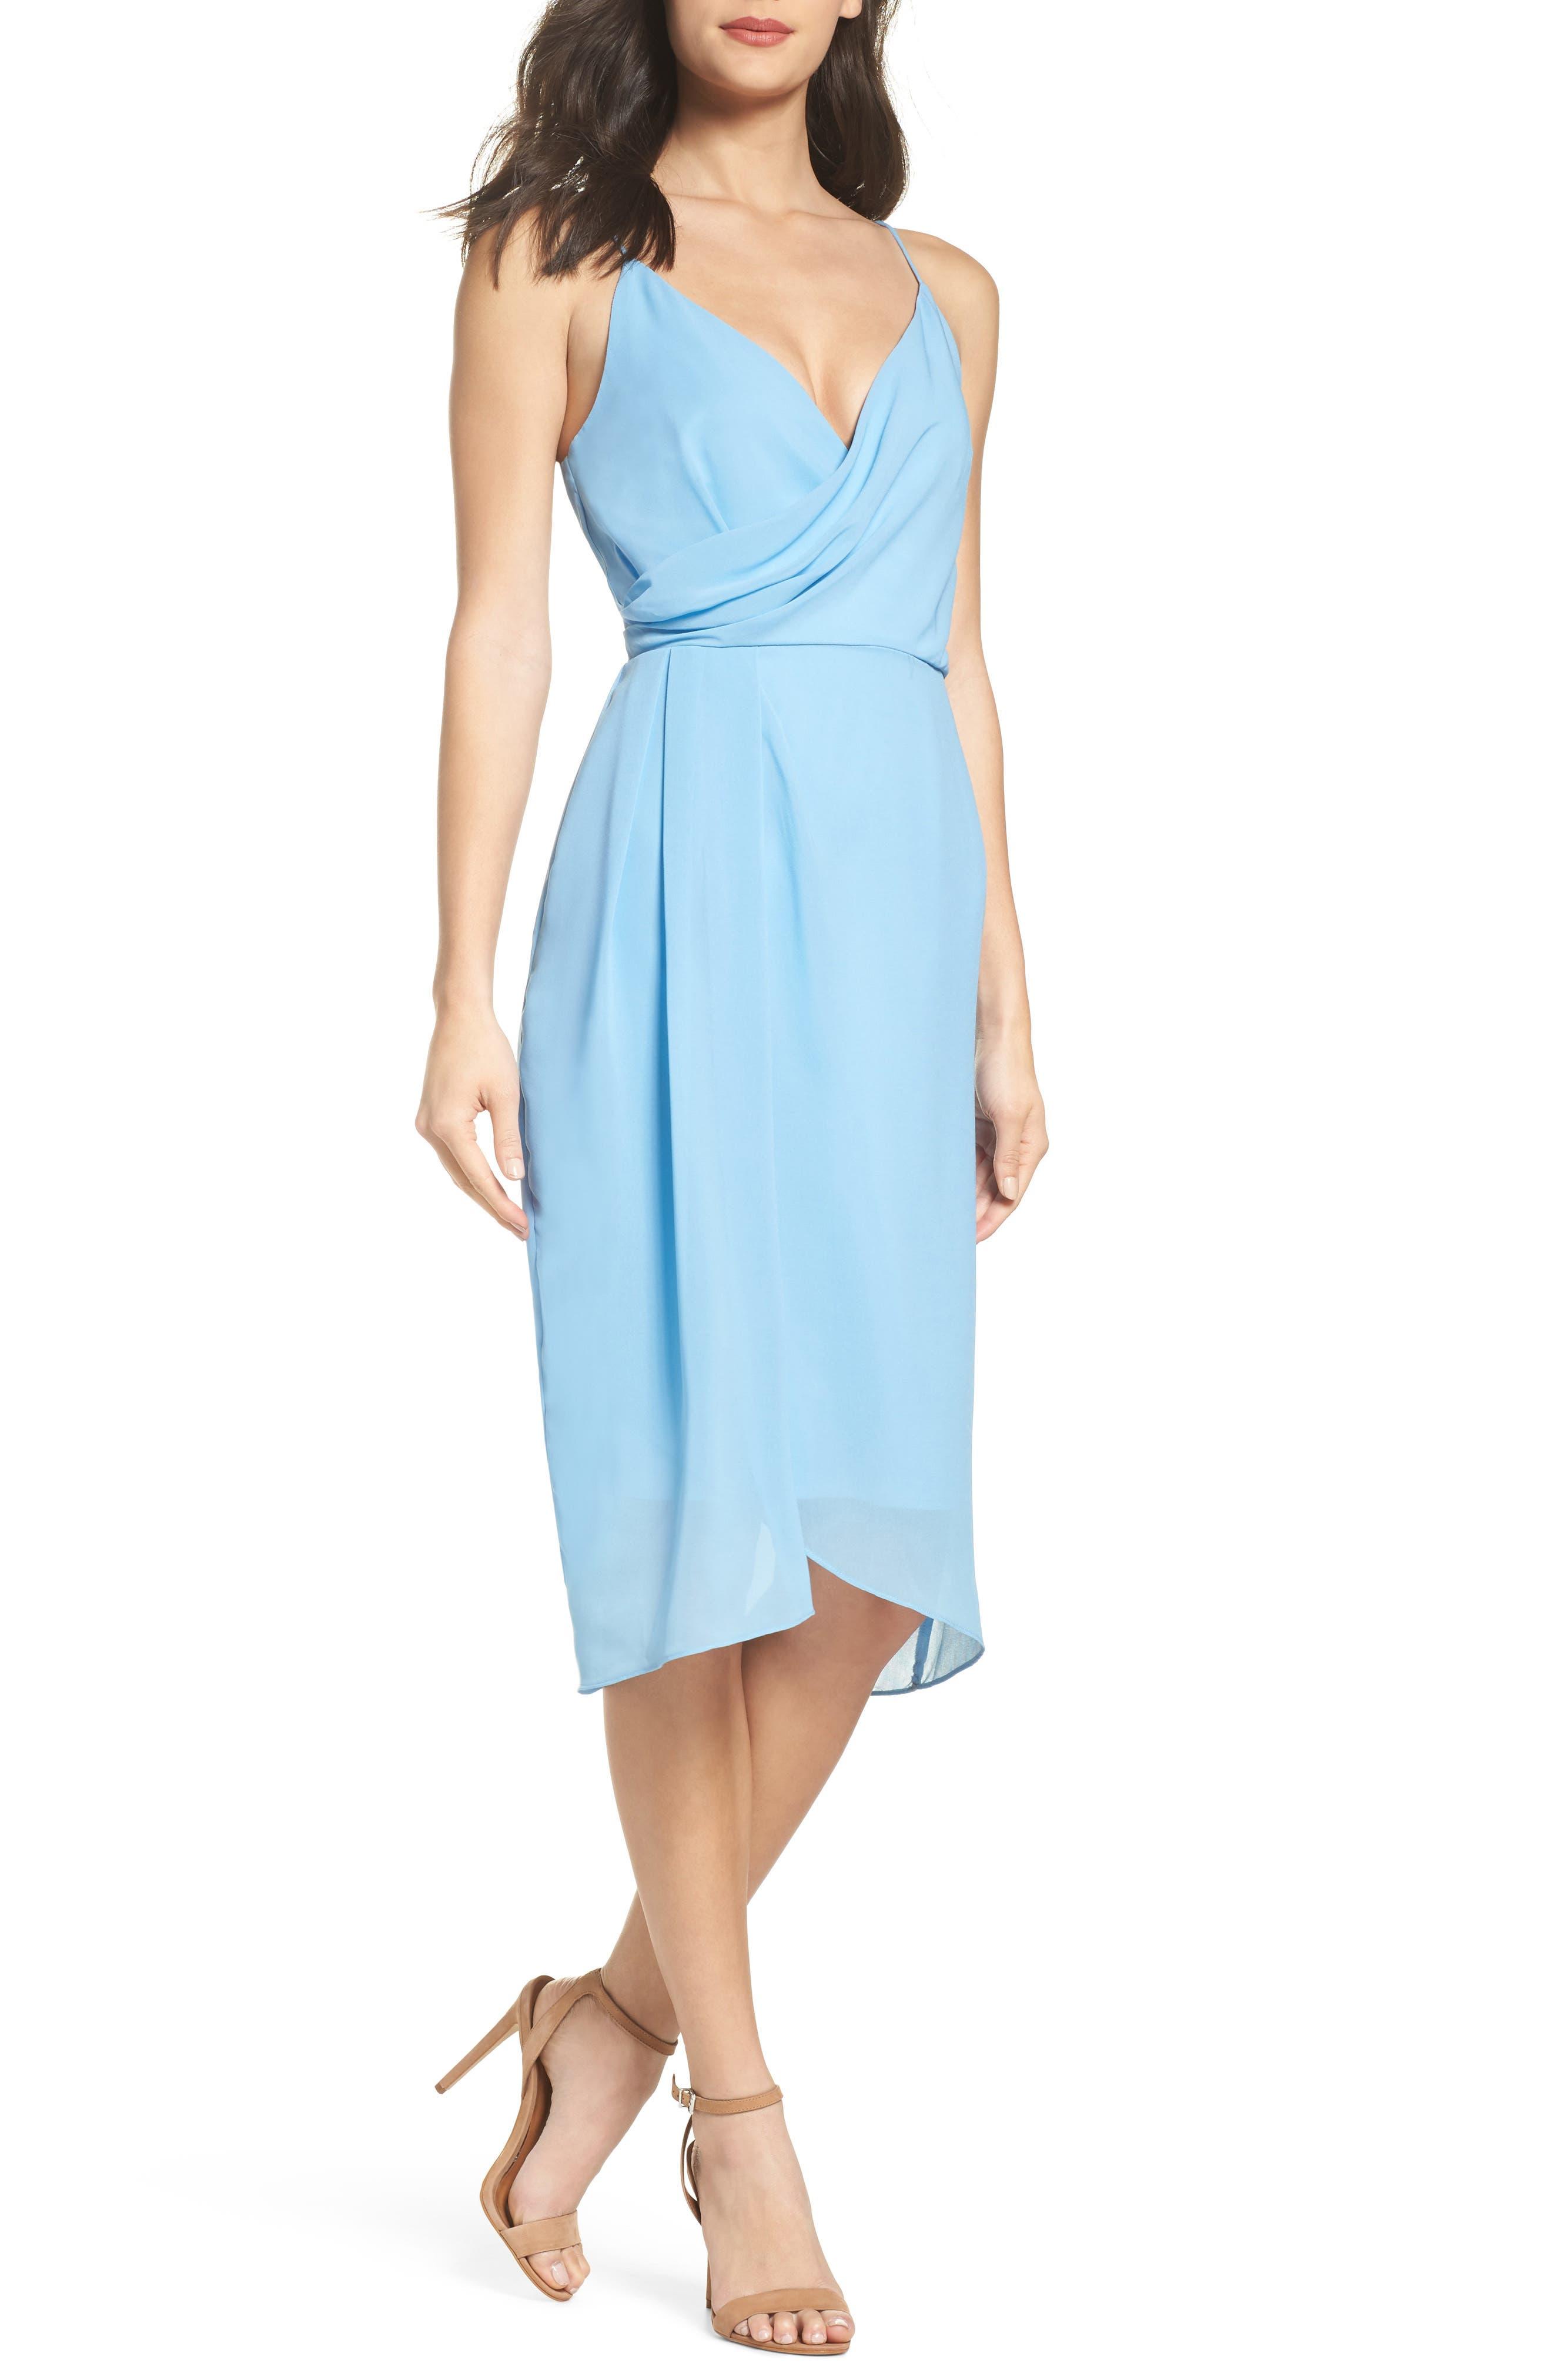 Ember Glow Drape Dress,                             Main thumbnail 1, color,                             Dusk Blue